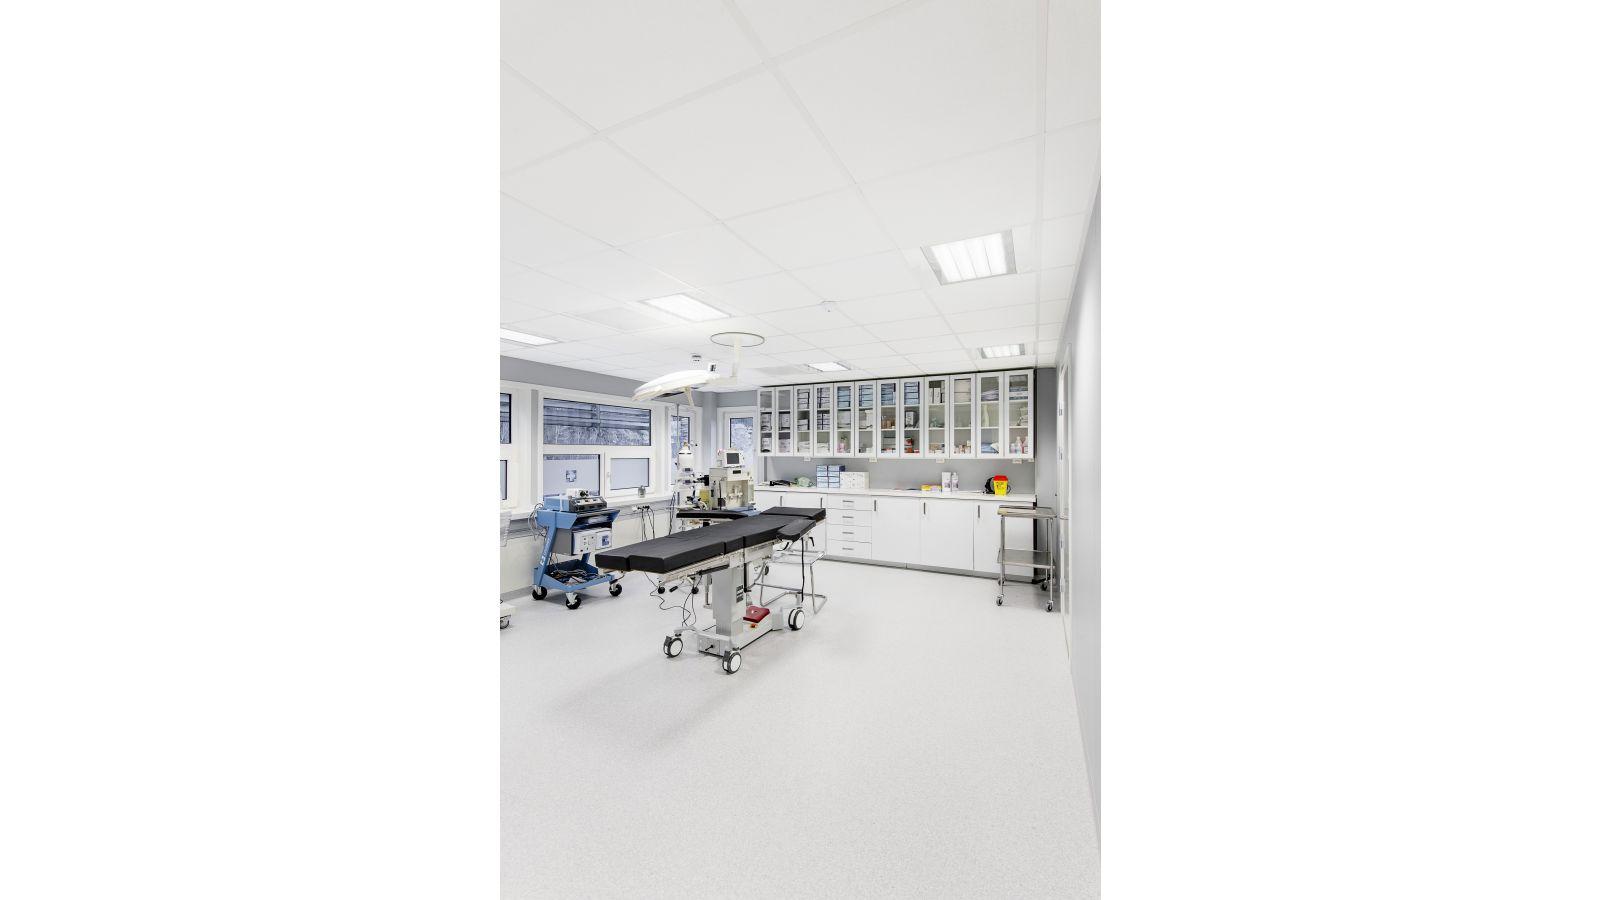 ROCKFON Medical stone wool ceiling panels